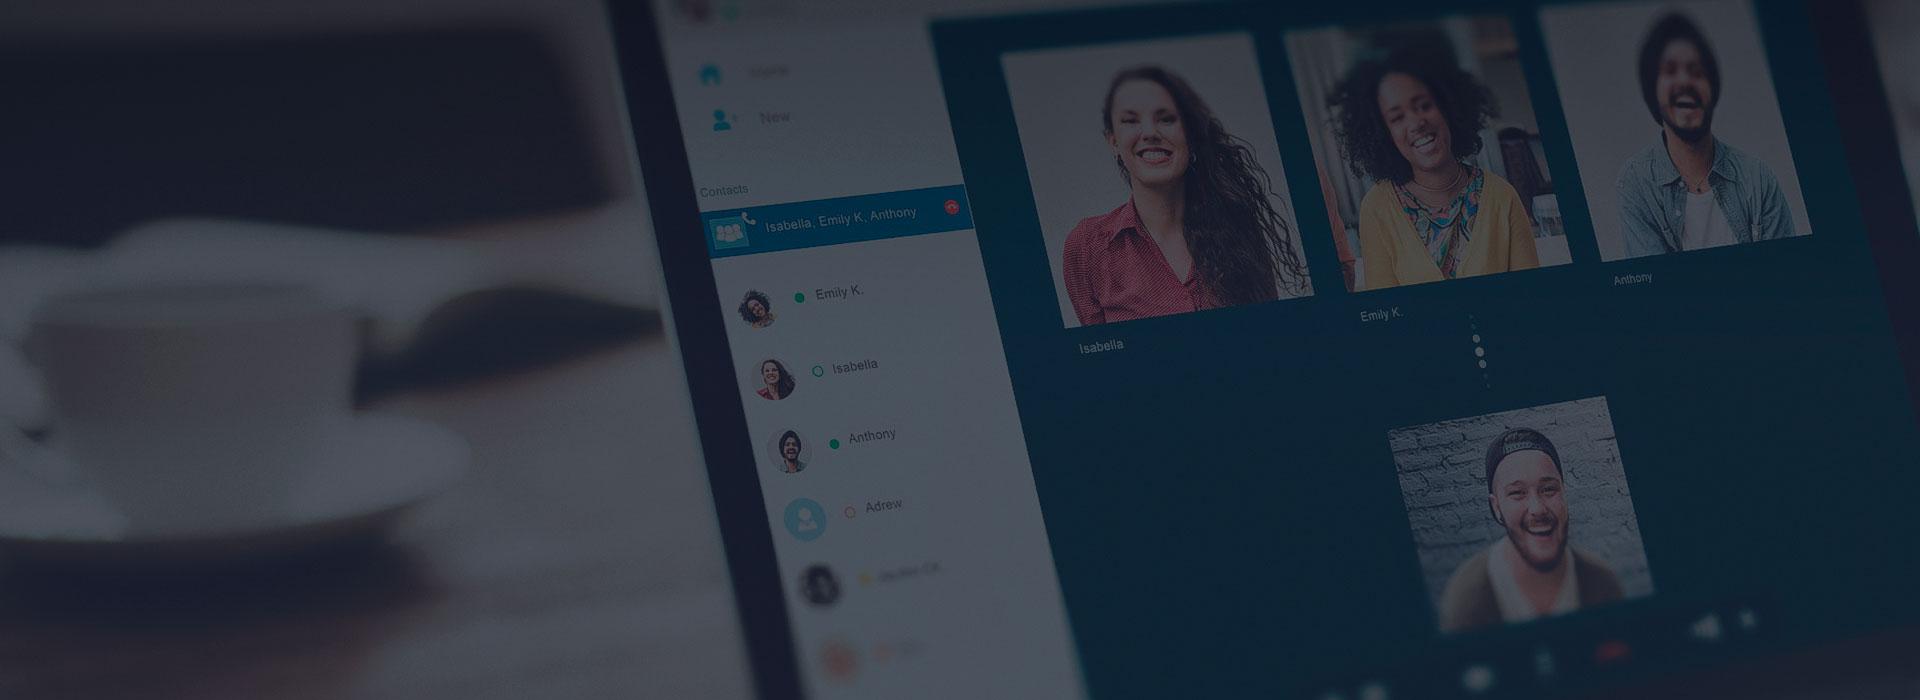 WebRTC Application Development Services | Oxagile